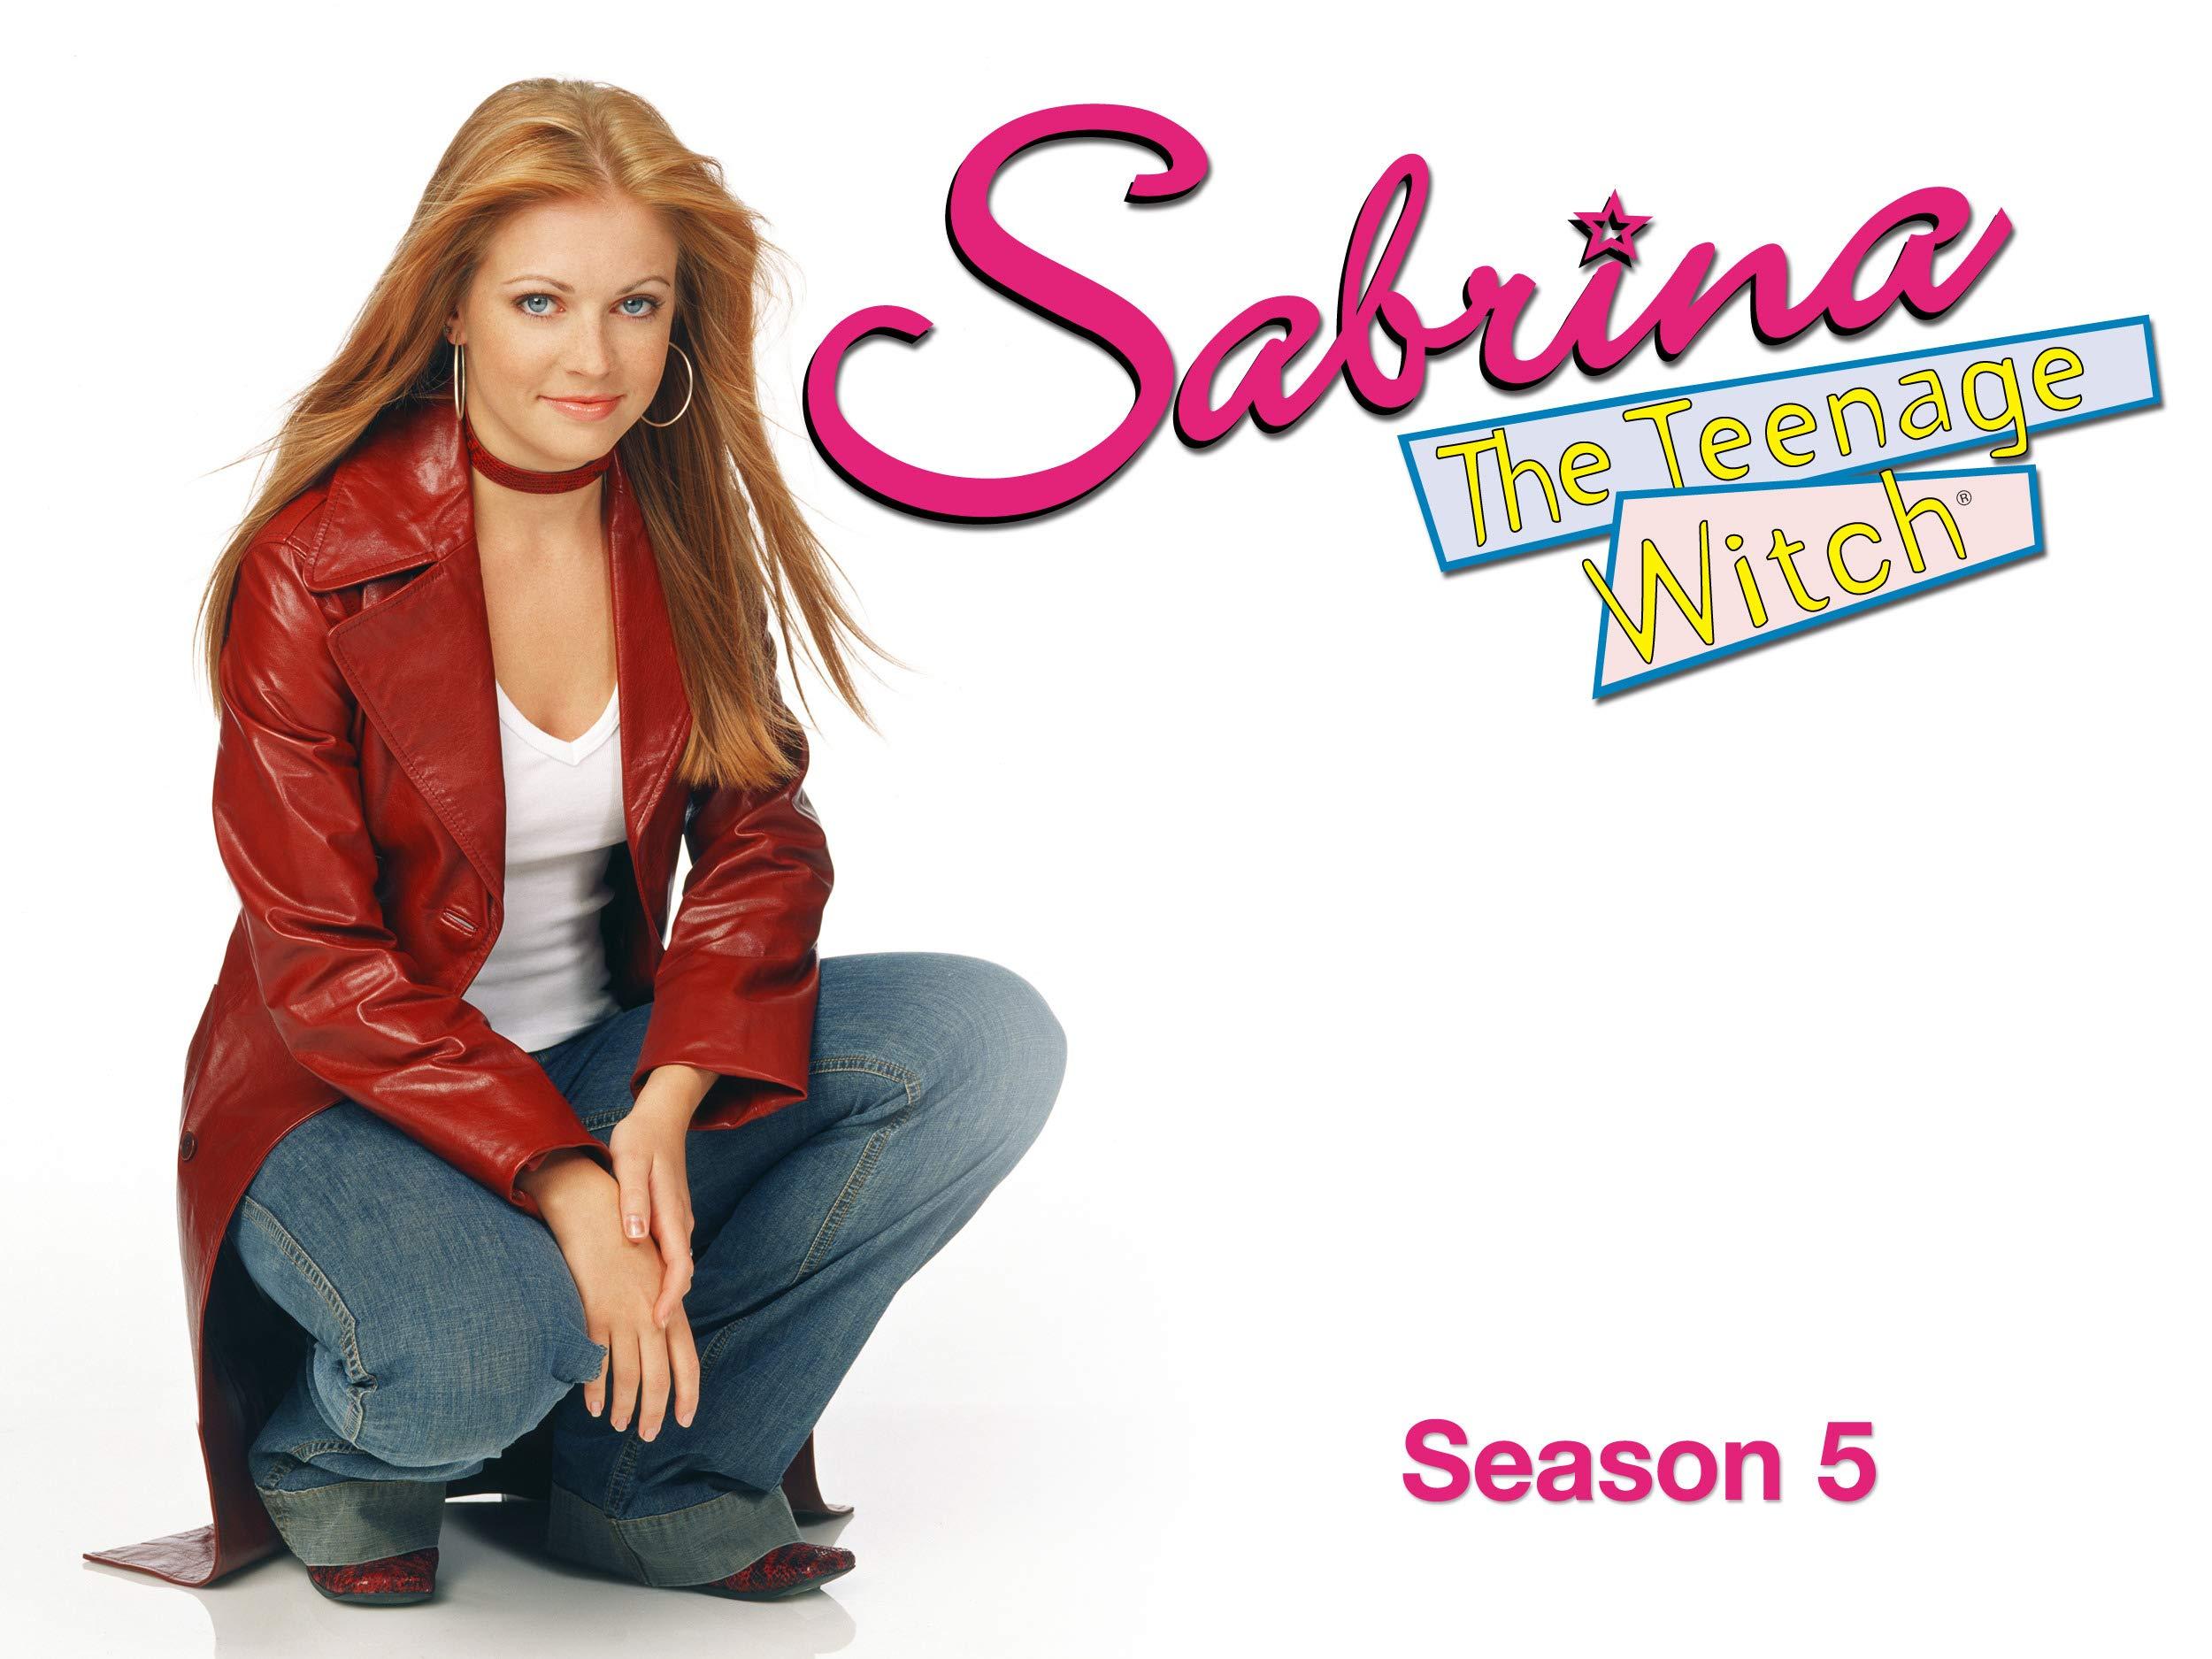 Sabrina: The Teenage Witch - Season 5